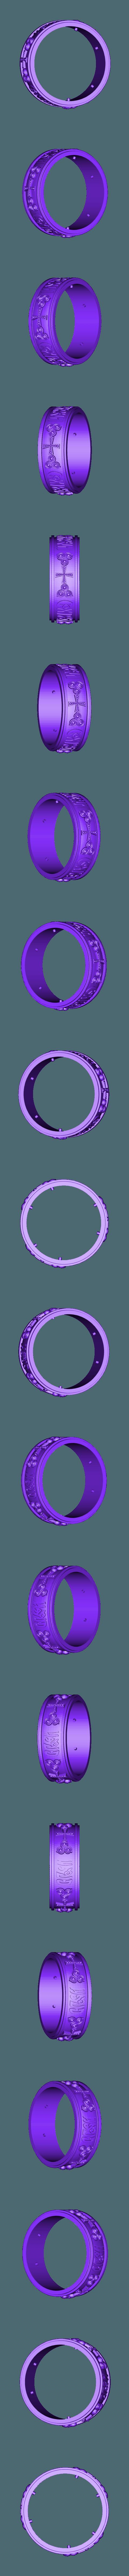 30.stl Download free STL file art ring • 3D printer template, 3DPrinterFiles